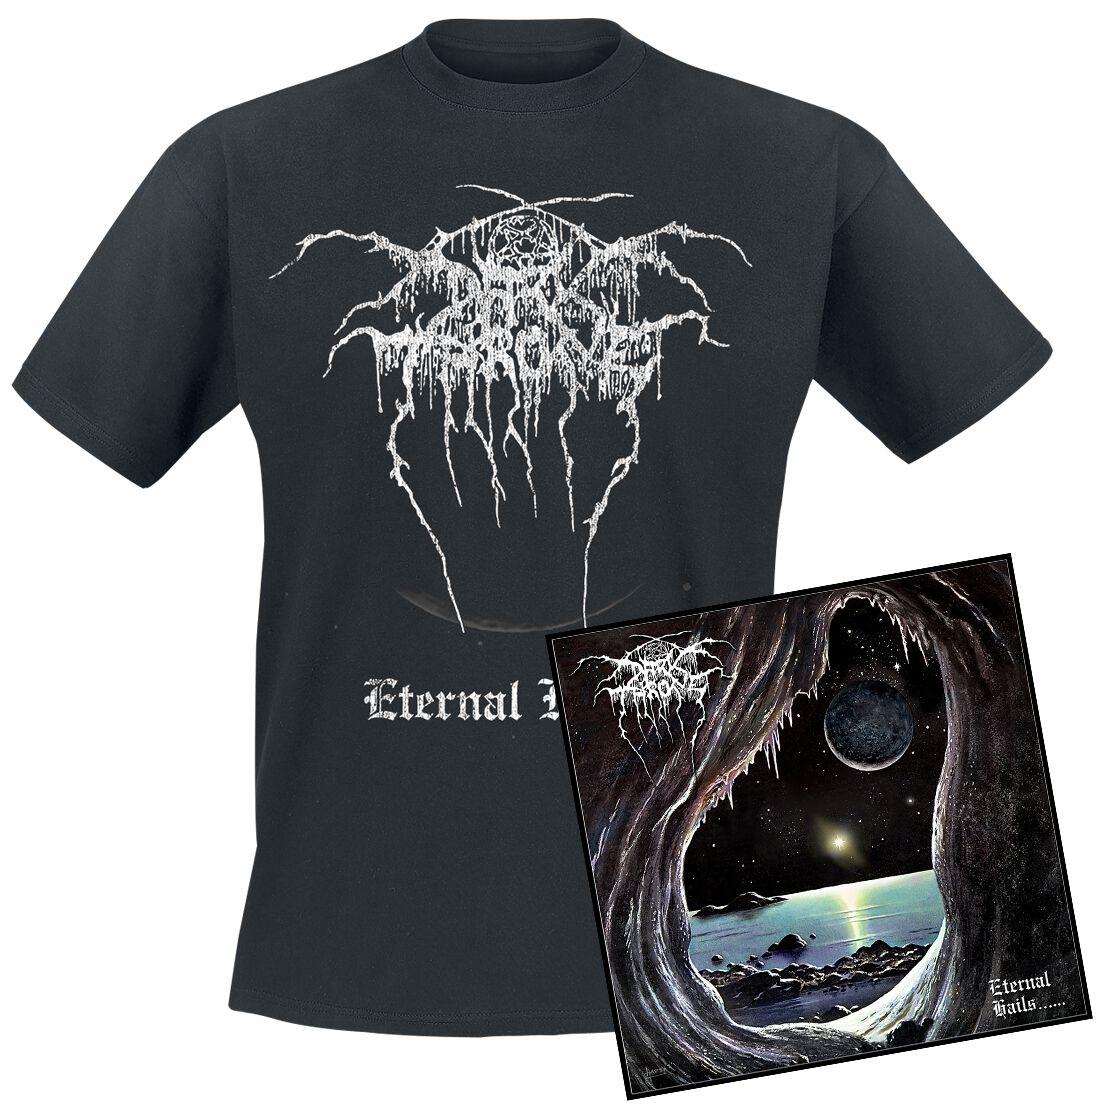 Image of Darkthrone Eternal hails CD & T-Shirt Standard